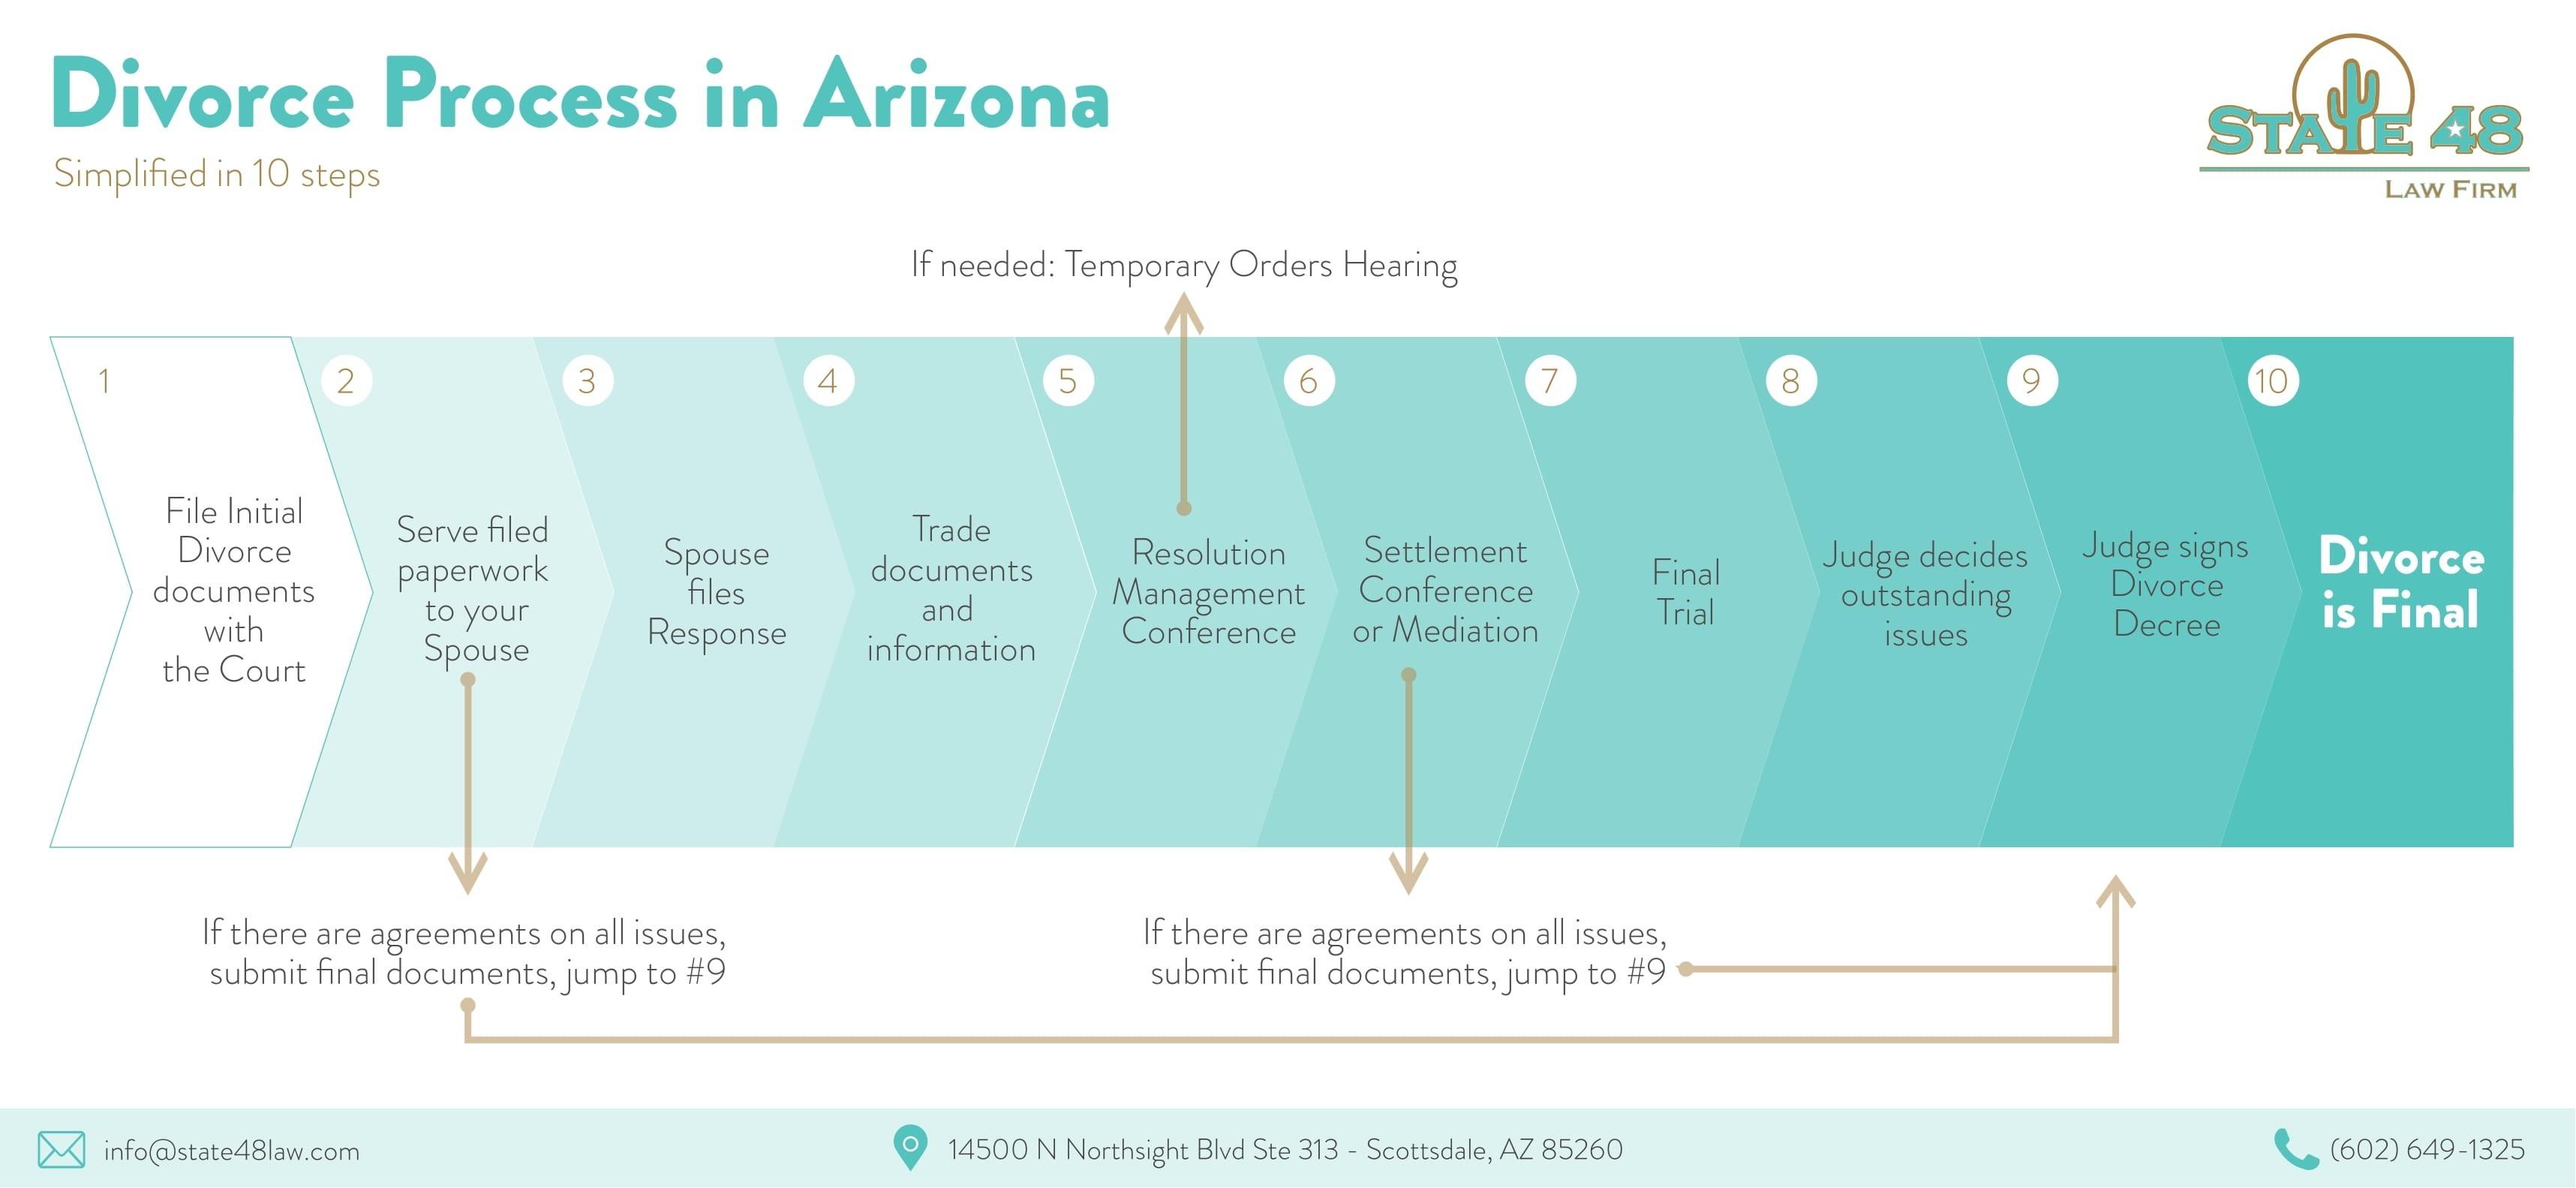 Divorce Process in Arizona